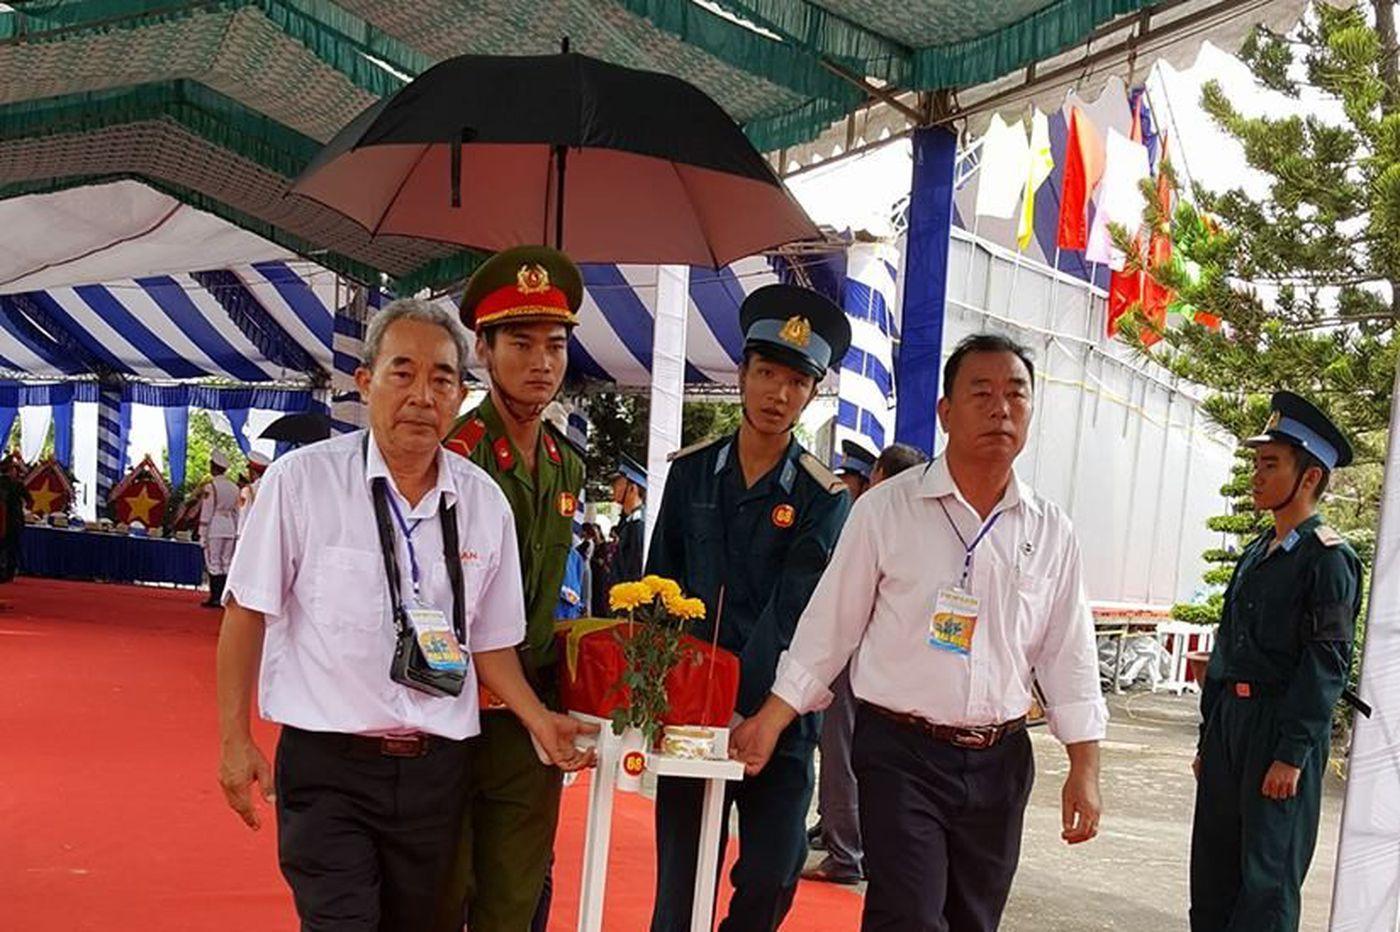 Vietnam making slow progress in finding lost soldiers